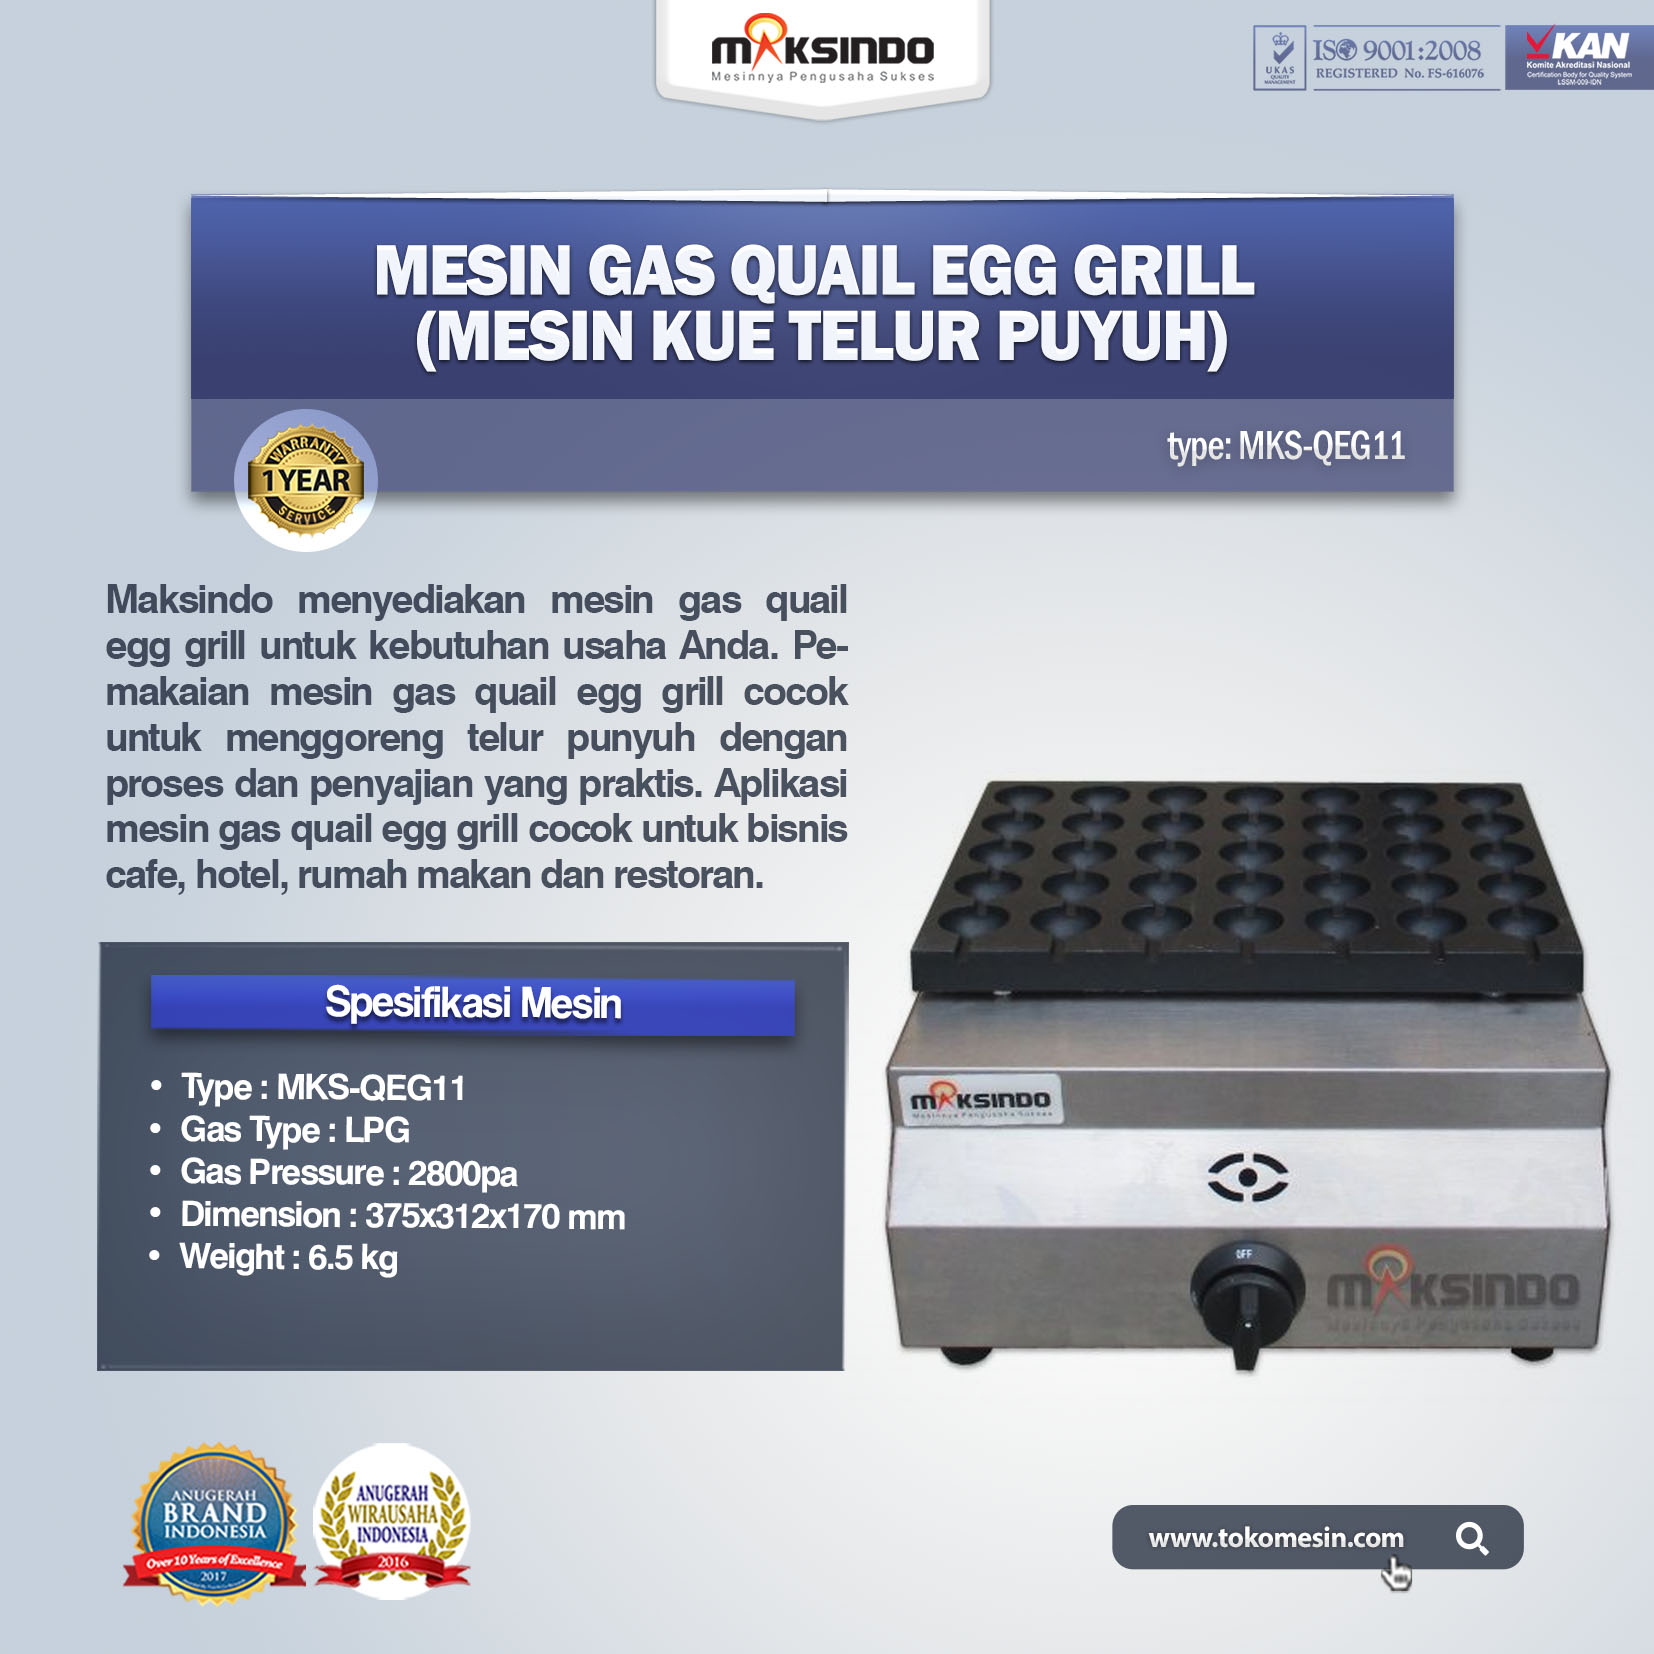 Mesin Gas Quail Egg Grill (Mesin Kue Telur Puyuh) MKS-QEG11